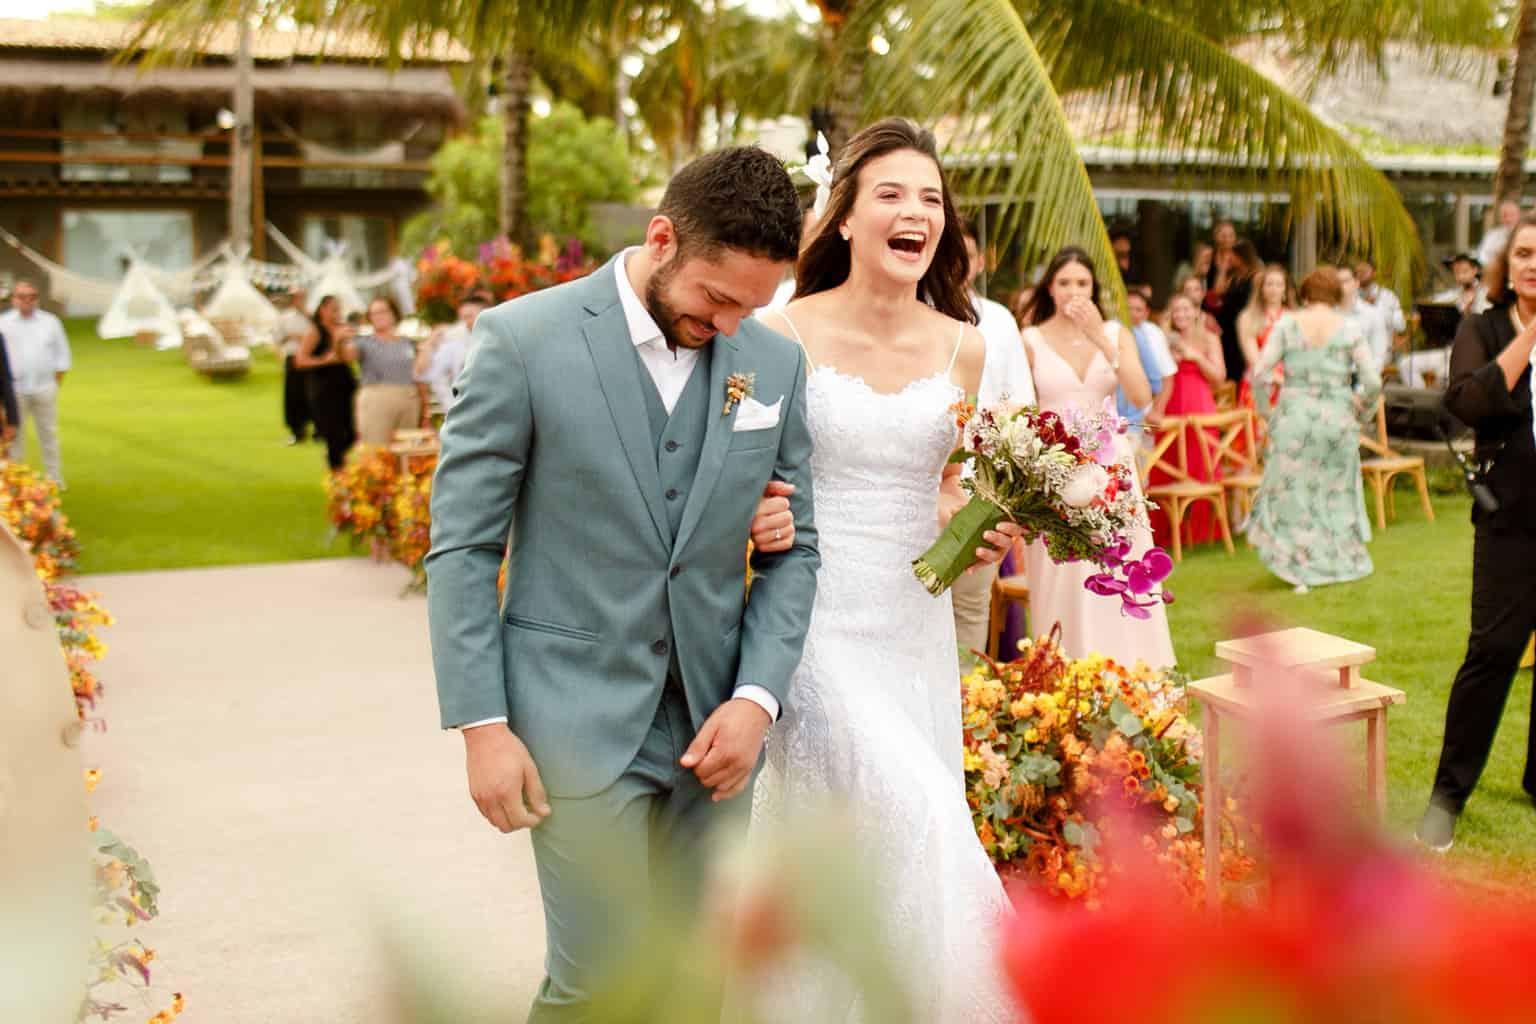 Casamento-Emanuelle-e-Alysson-Fotografia-Tadeu-Nanó-e-Luca-Antunes81-1